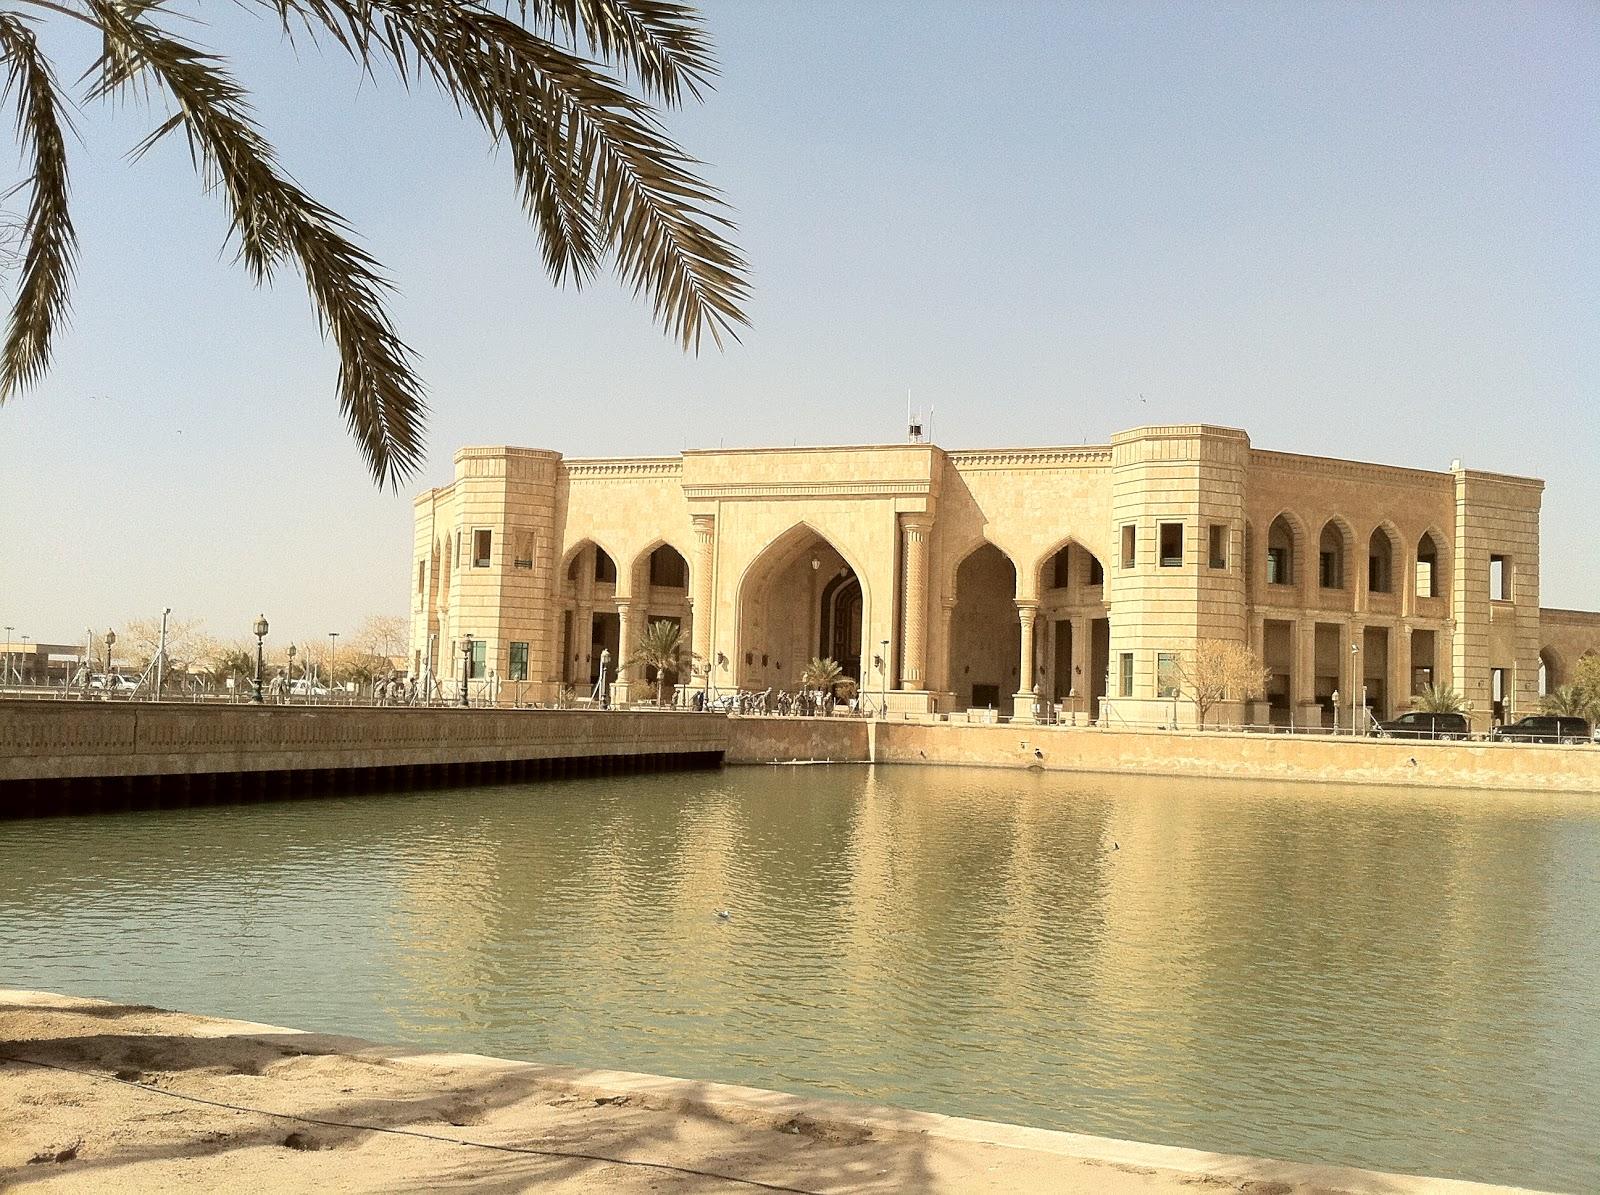 victory palace base baghdad fwa al america iran jbb authority transfer went army